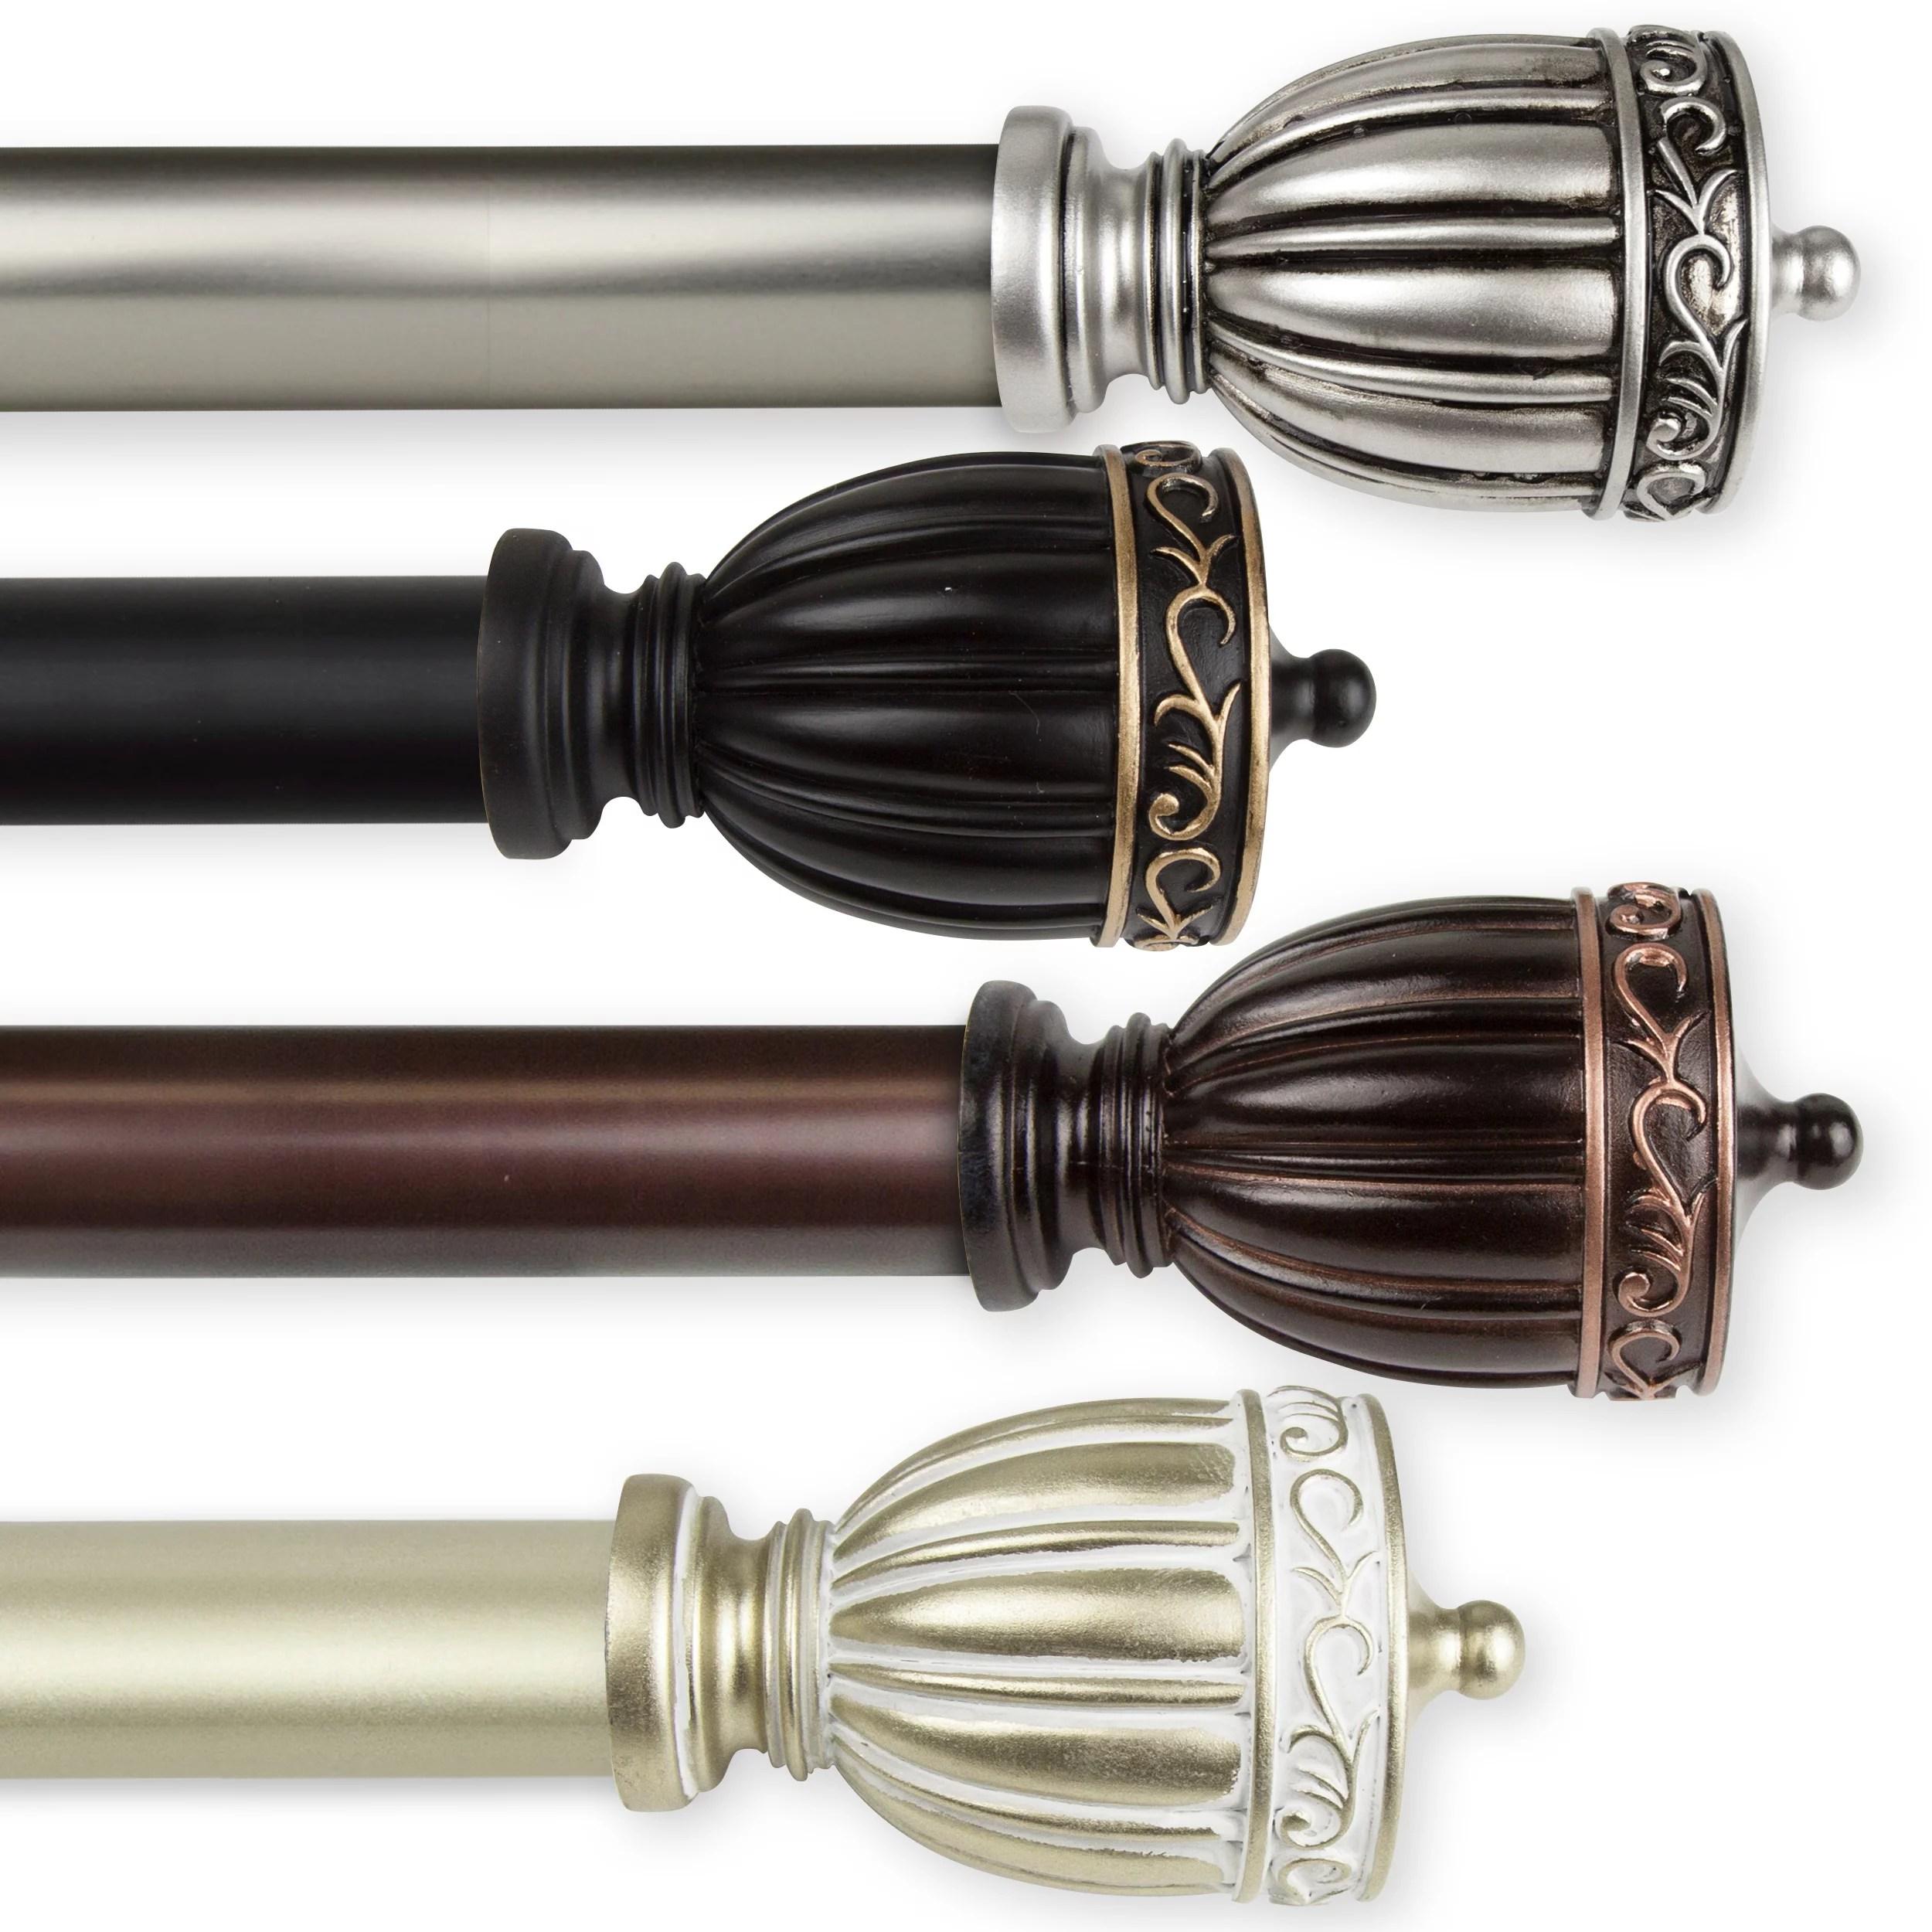 debussy 1 dia curtain rod 160 240 inch black